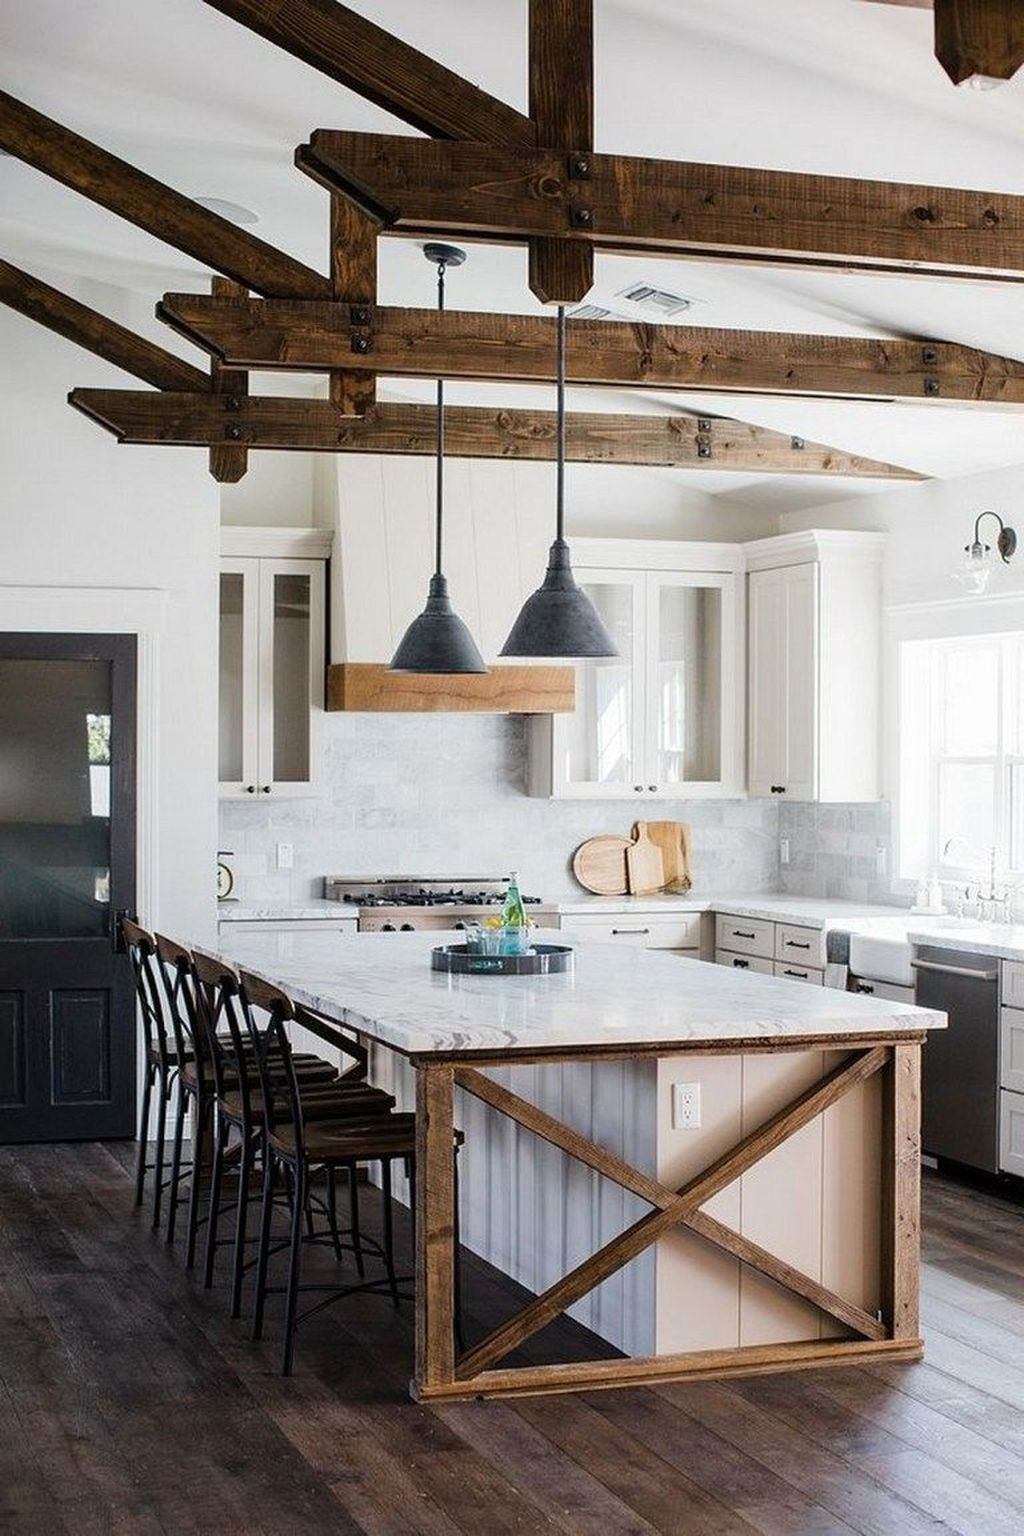 41 comfy farmhouse kitchen ideas kitchen design ideas home decor rh pinterest com